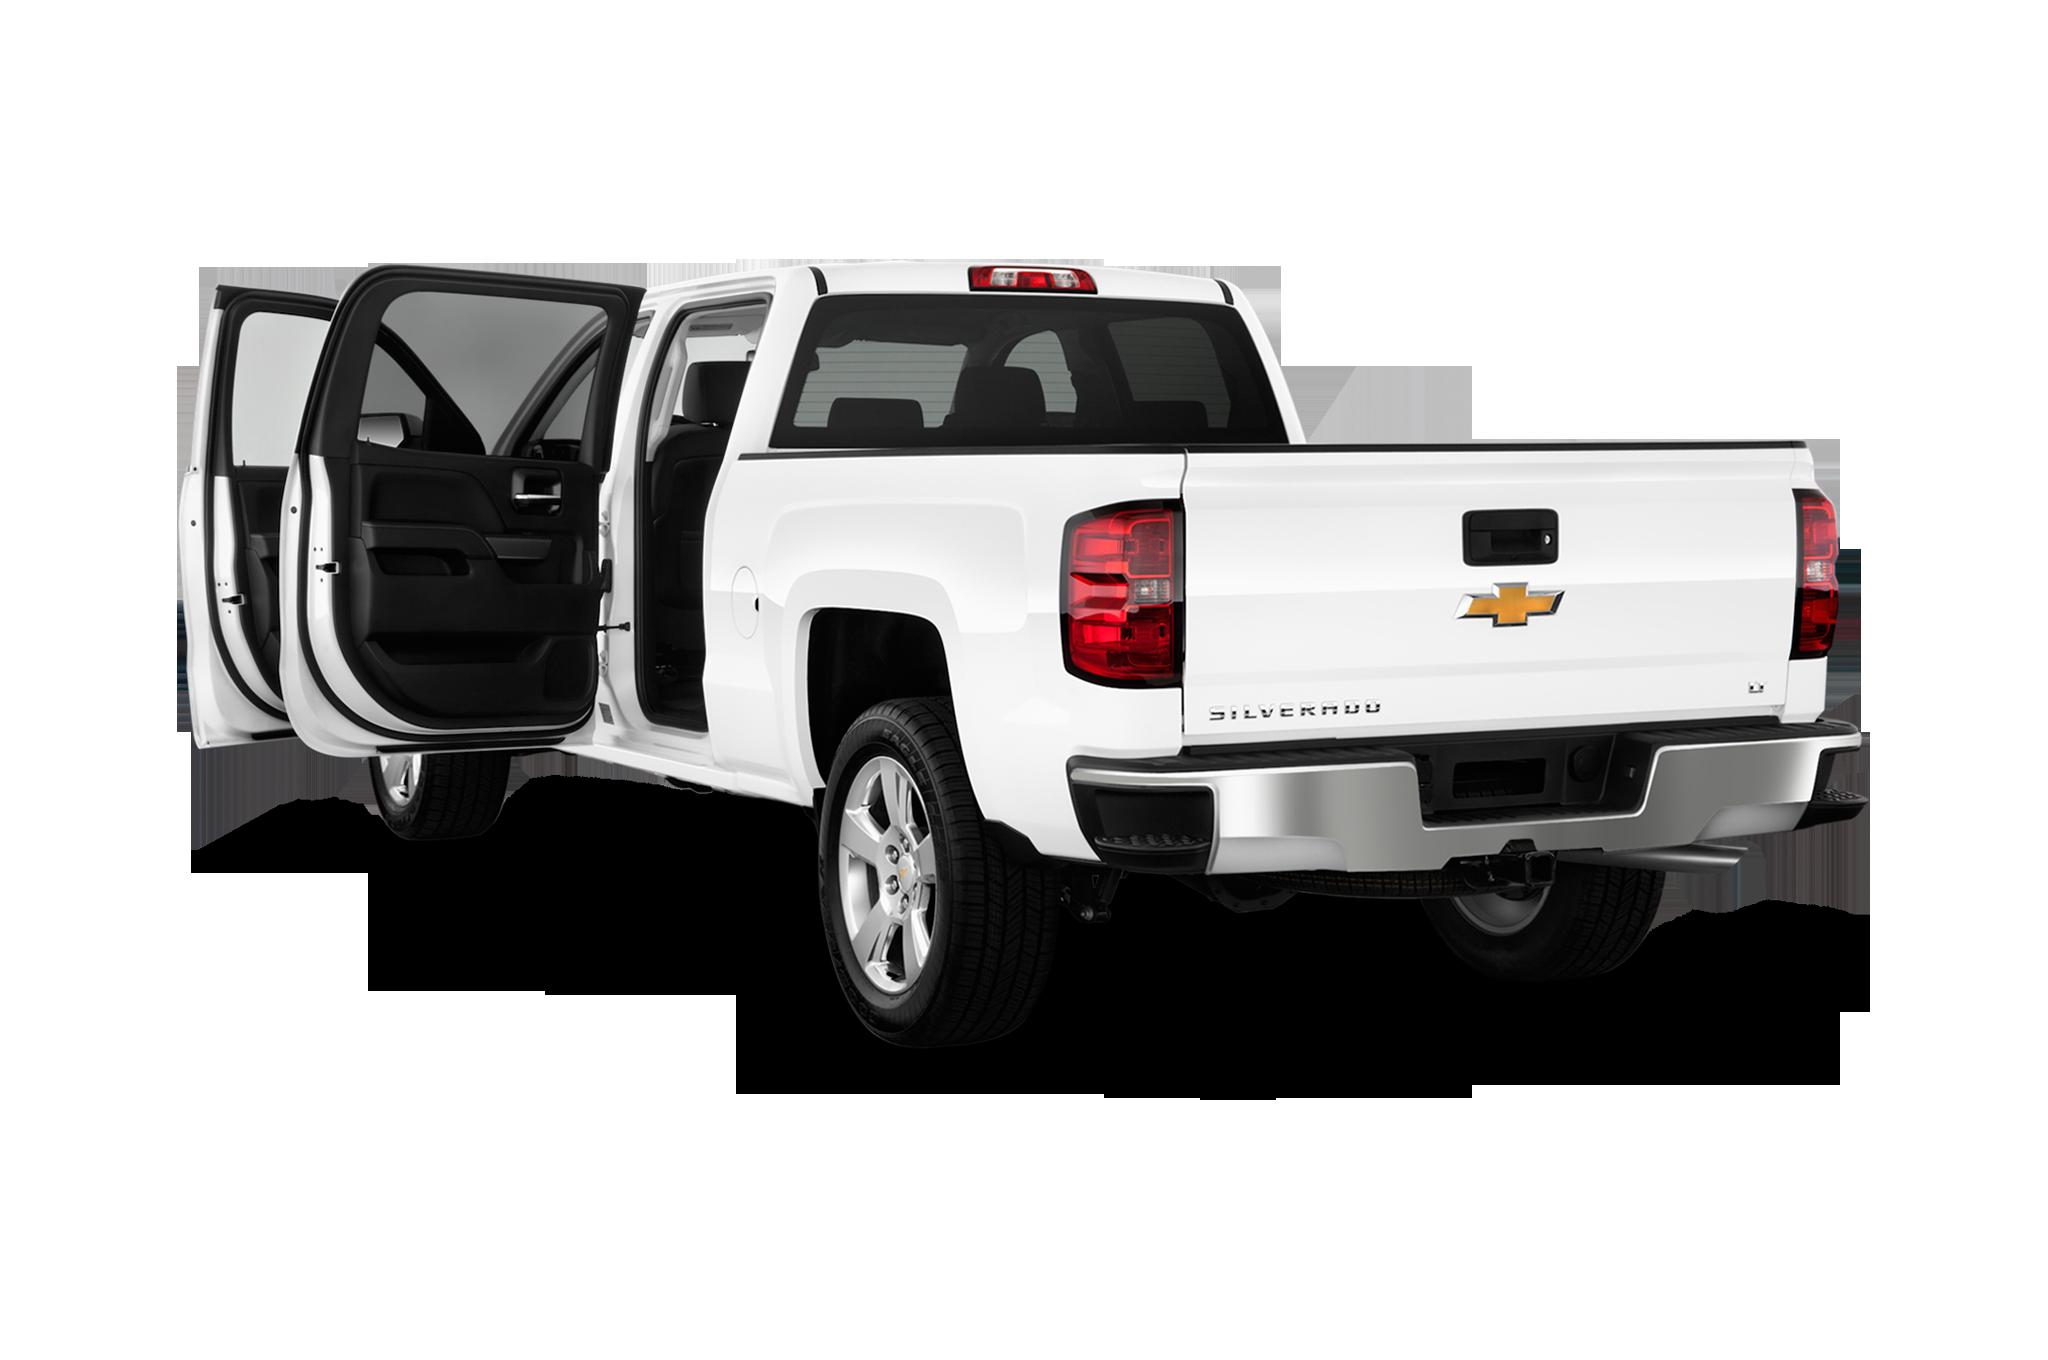 2016 chevrolet silverado gmc sierra add eassist hybrid for 10 door truck